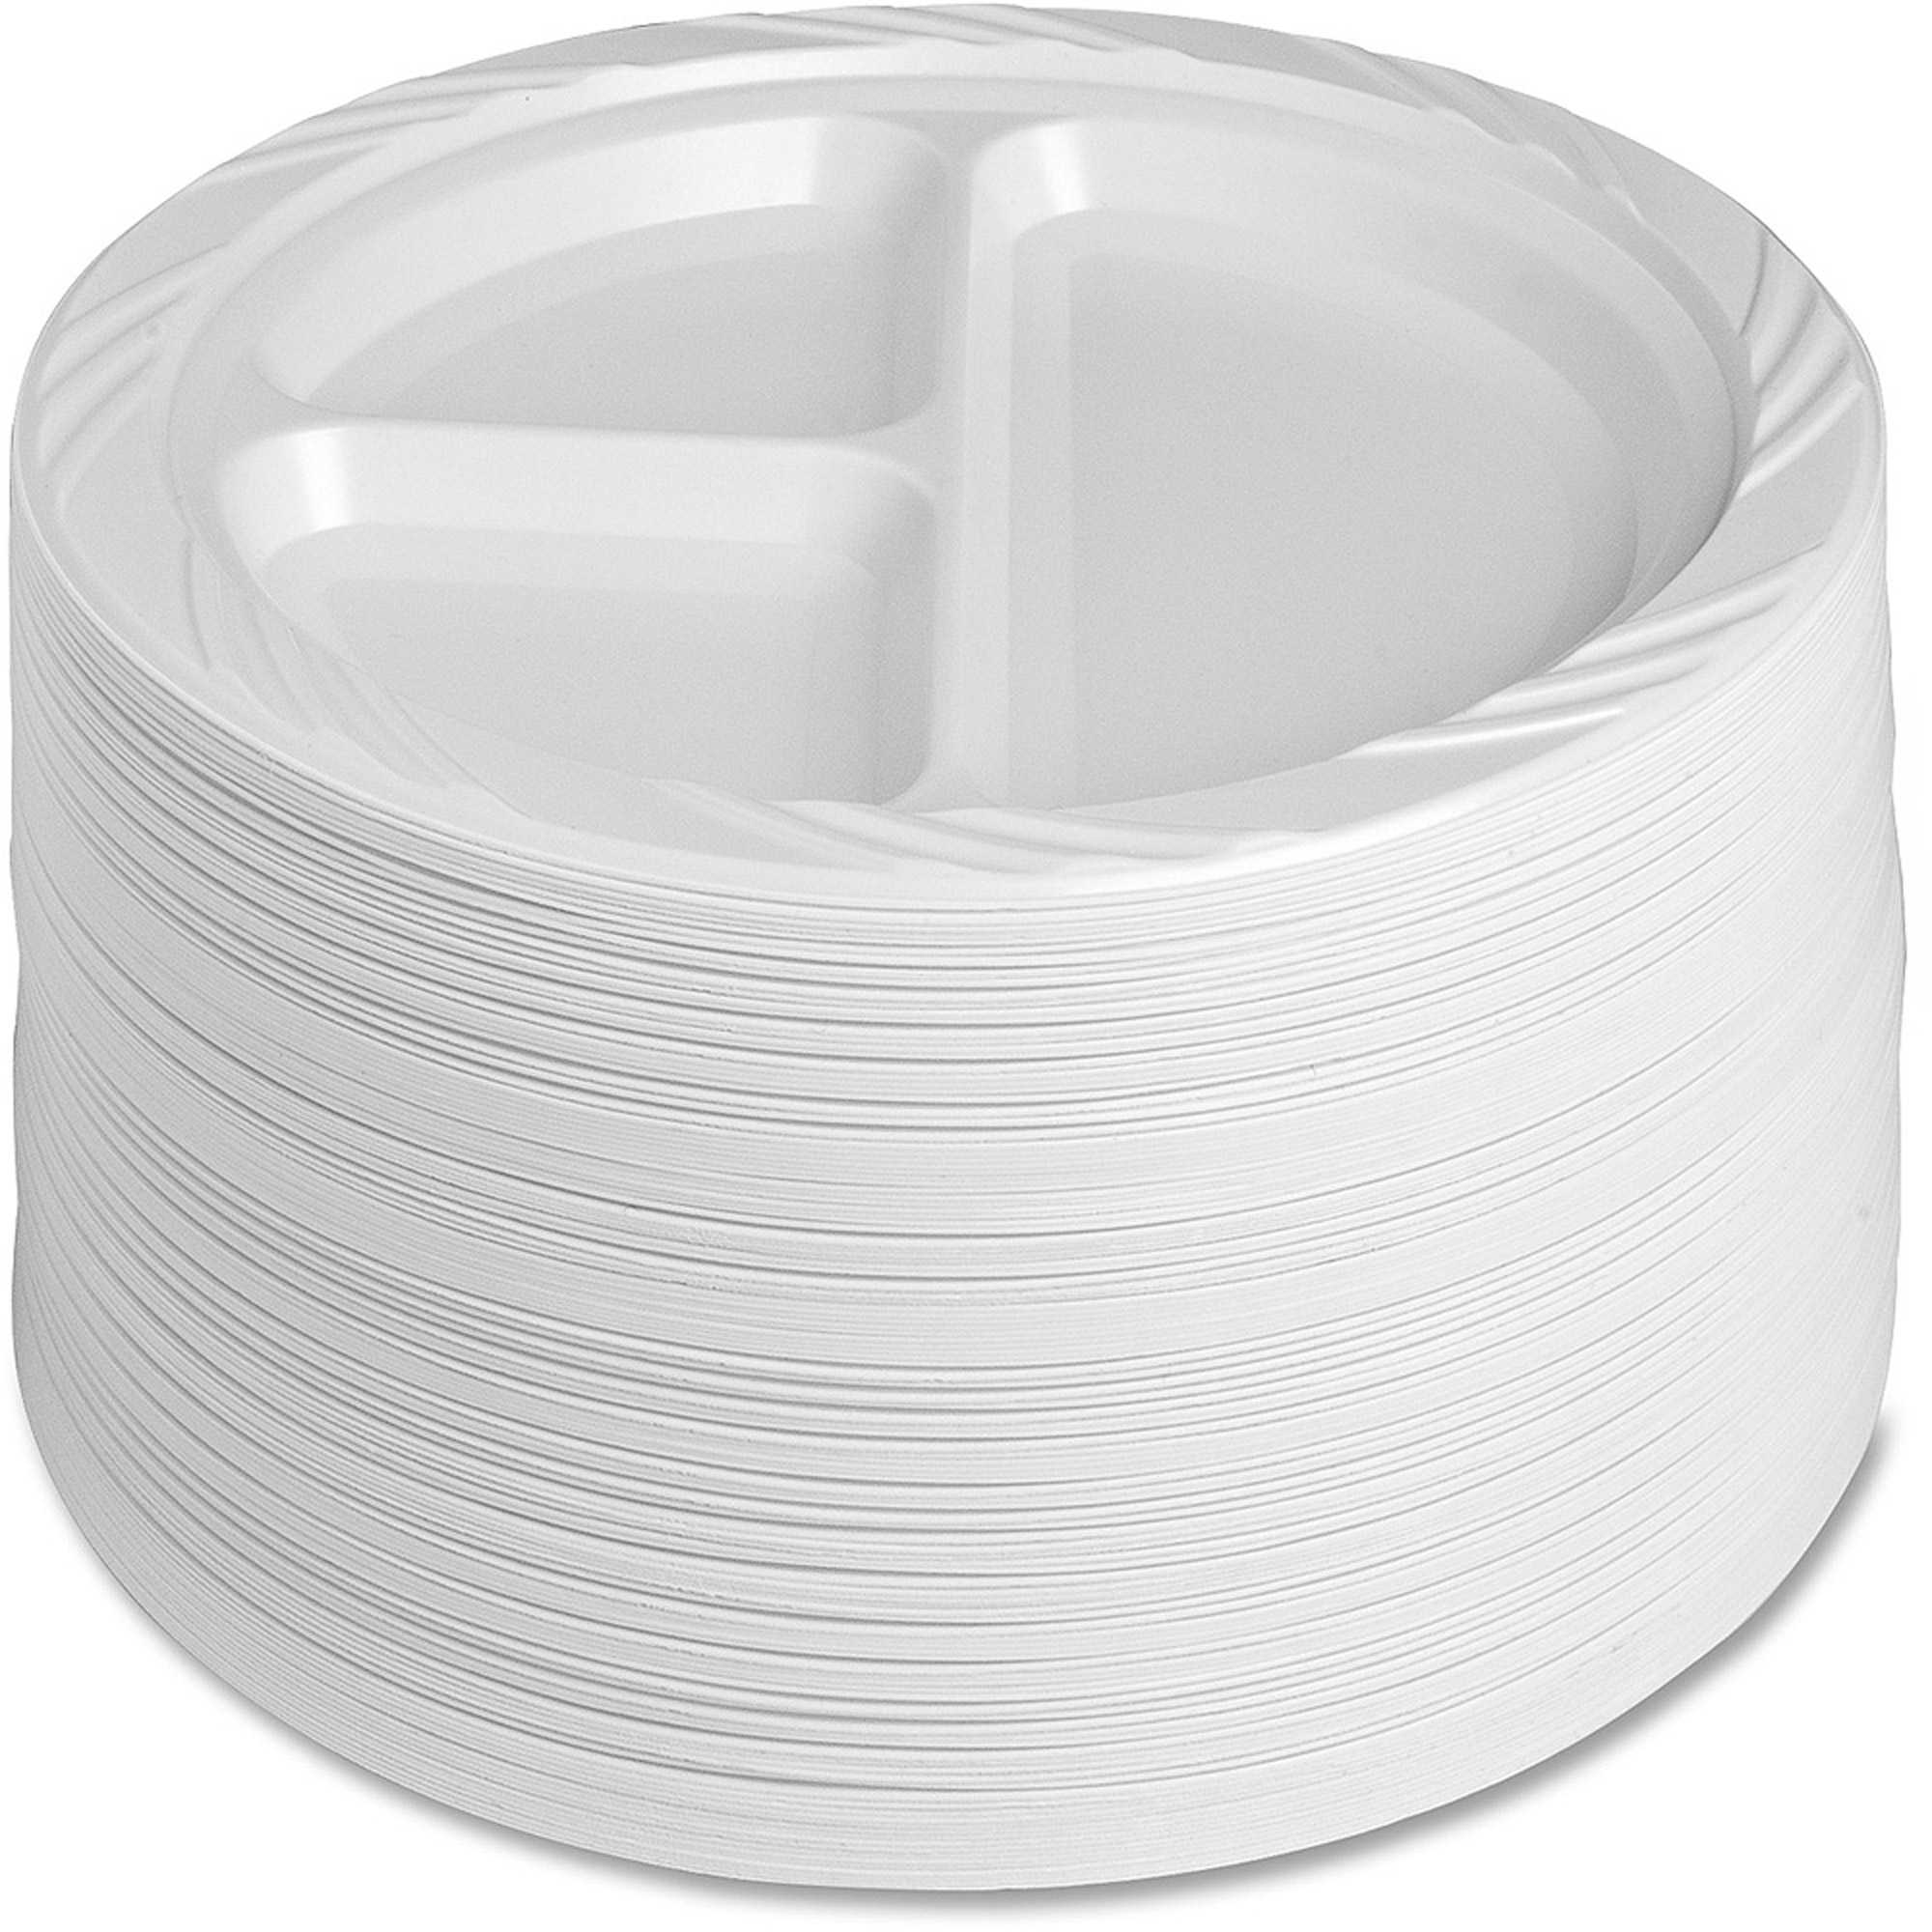 "Genuine Joe Reusable Divided Plastic Plates, White, 9"", 125 count"